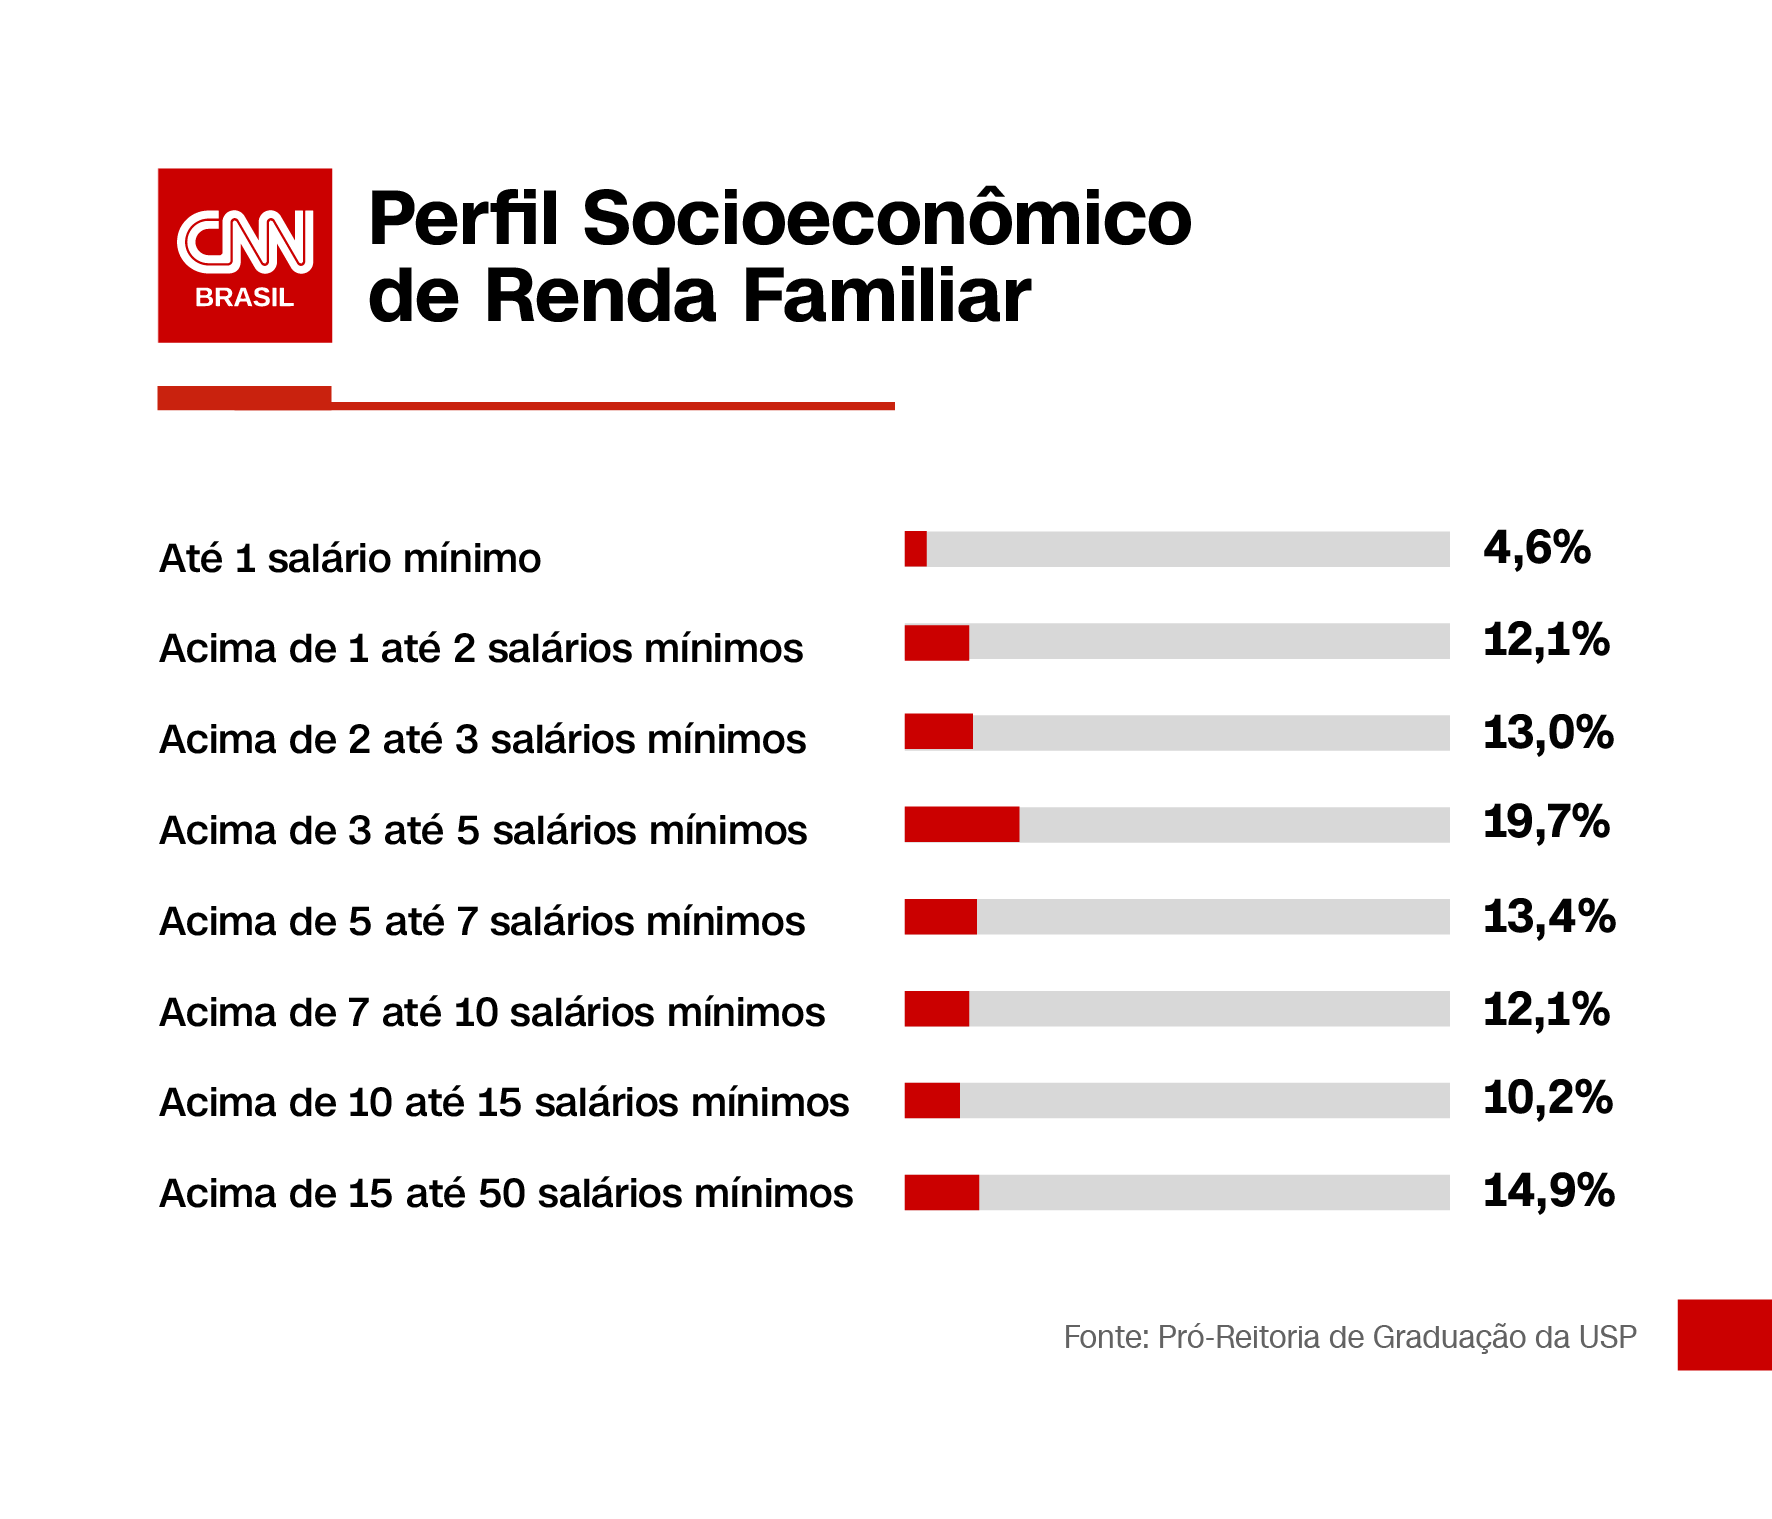 Perfil socieconômico de renda familiar